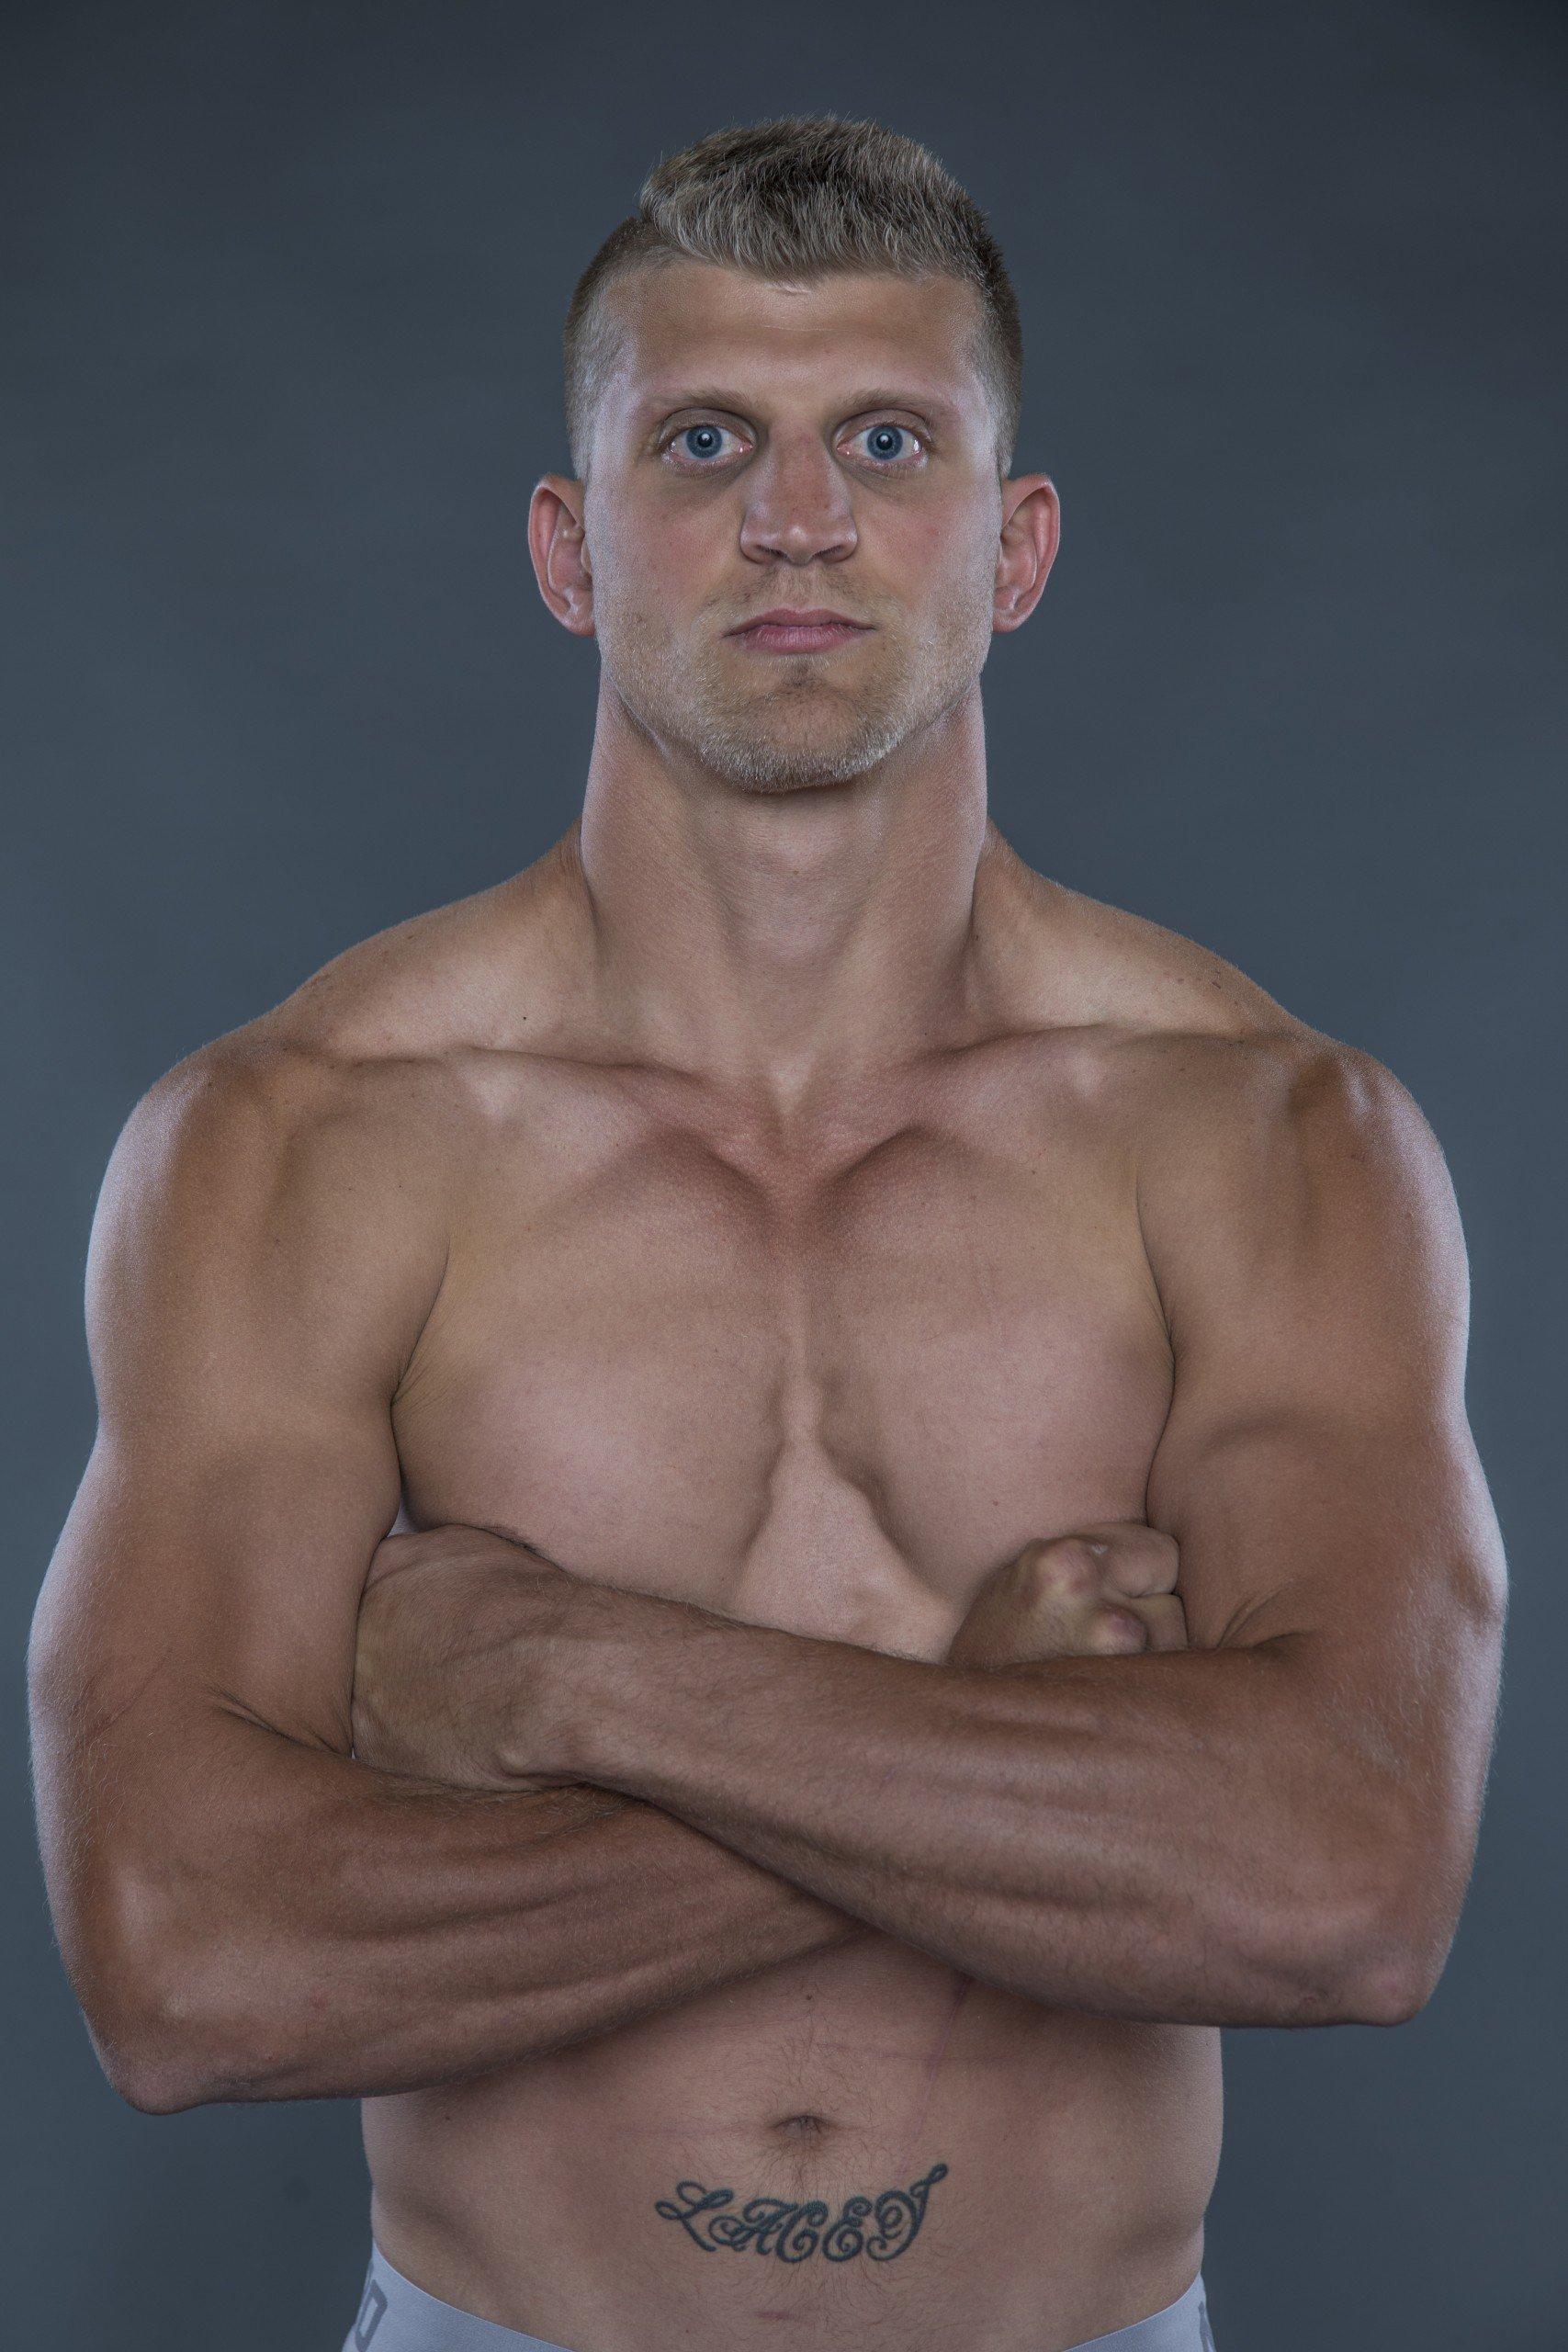 Joshua Dyer